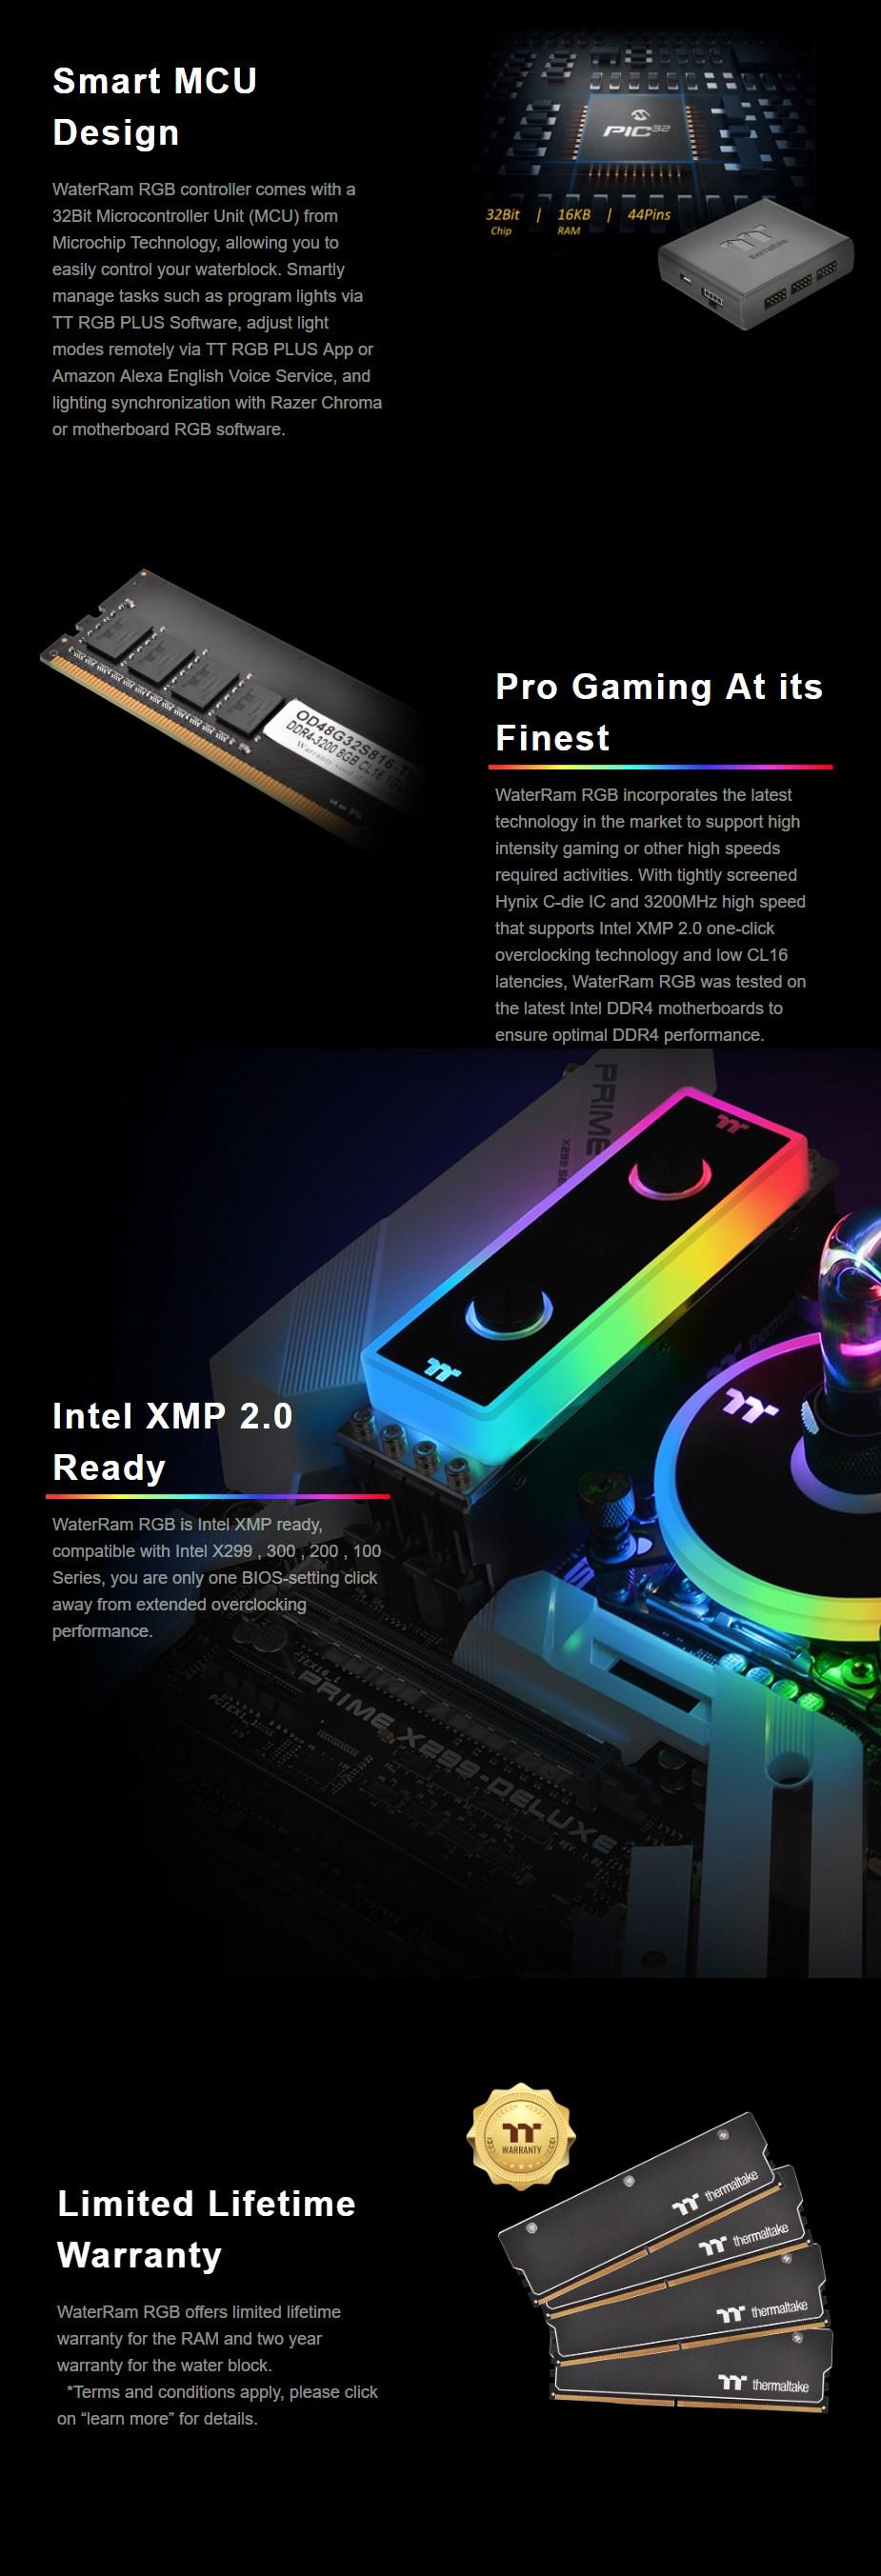 Thermaltake WaterRam 16GB (2x 8GB) 3200MHz DDR4 Liquid Cooled Memory - Desktop Overview 8